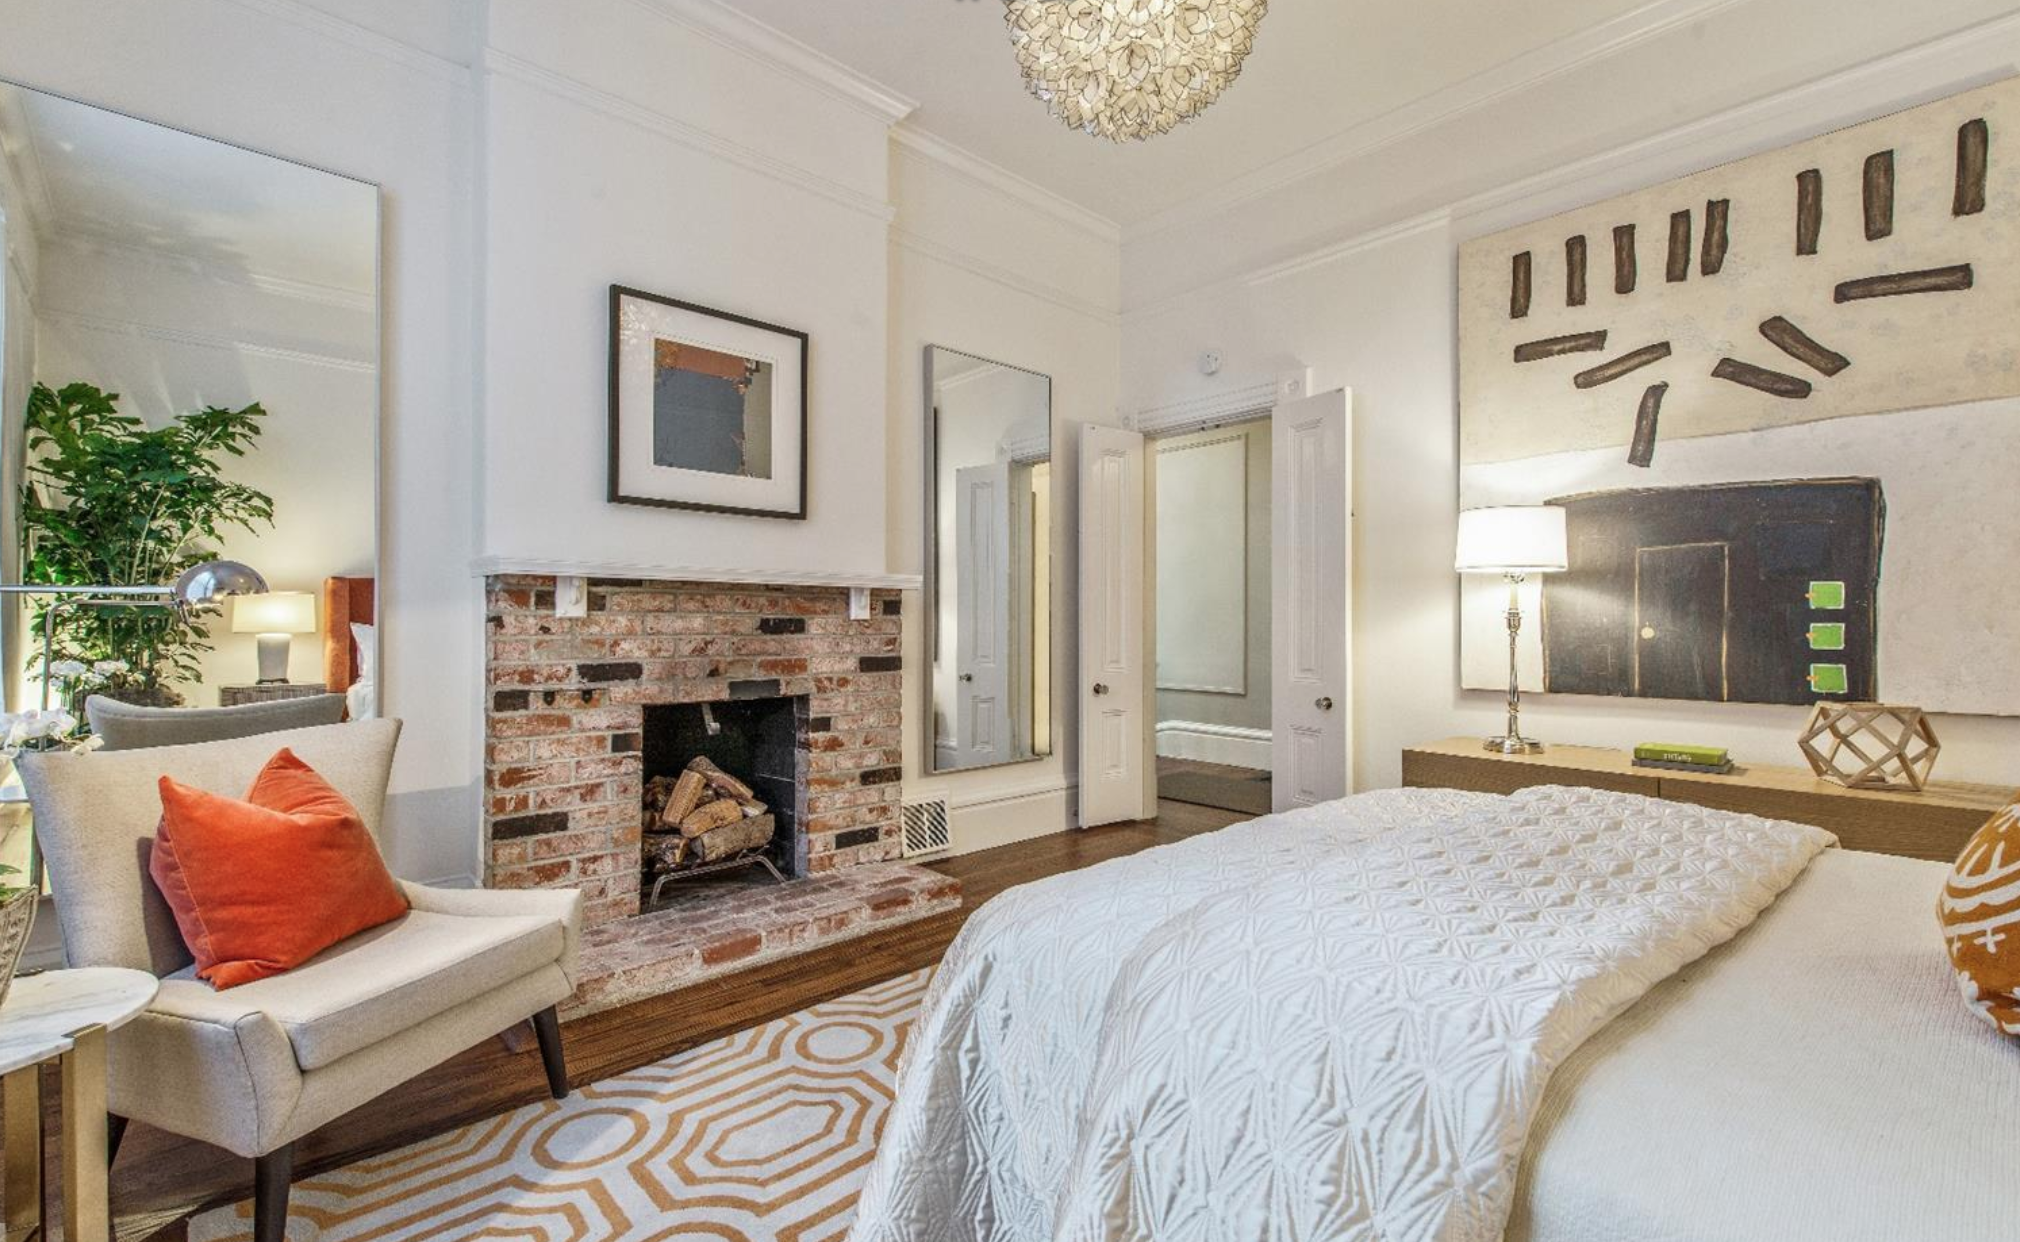 2046 Divisadero St - Guest Bedroom